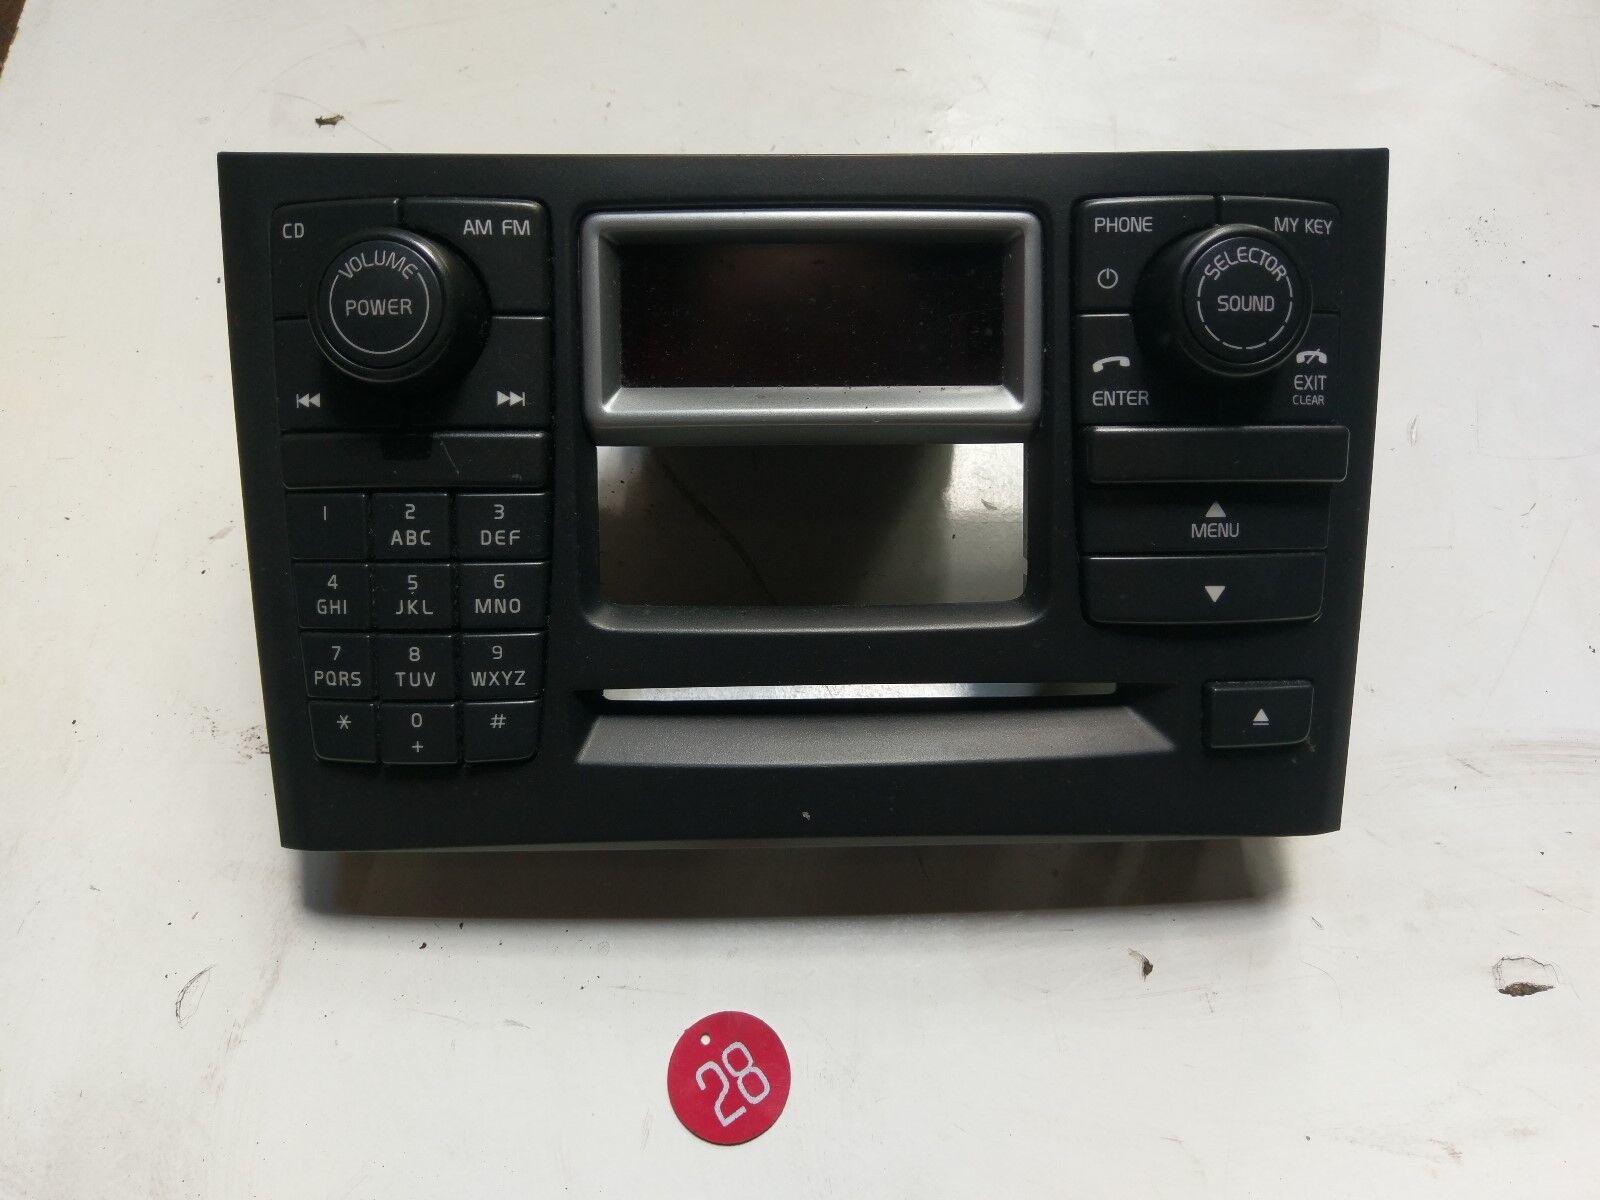 VOLVO  XC90 2005 Audio Equipment Radio Control Panel With Car Phone 30732642